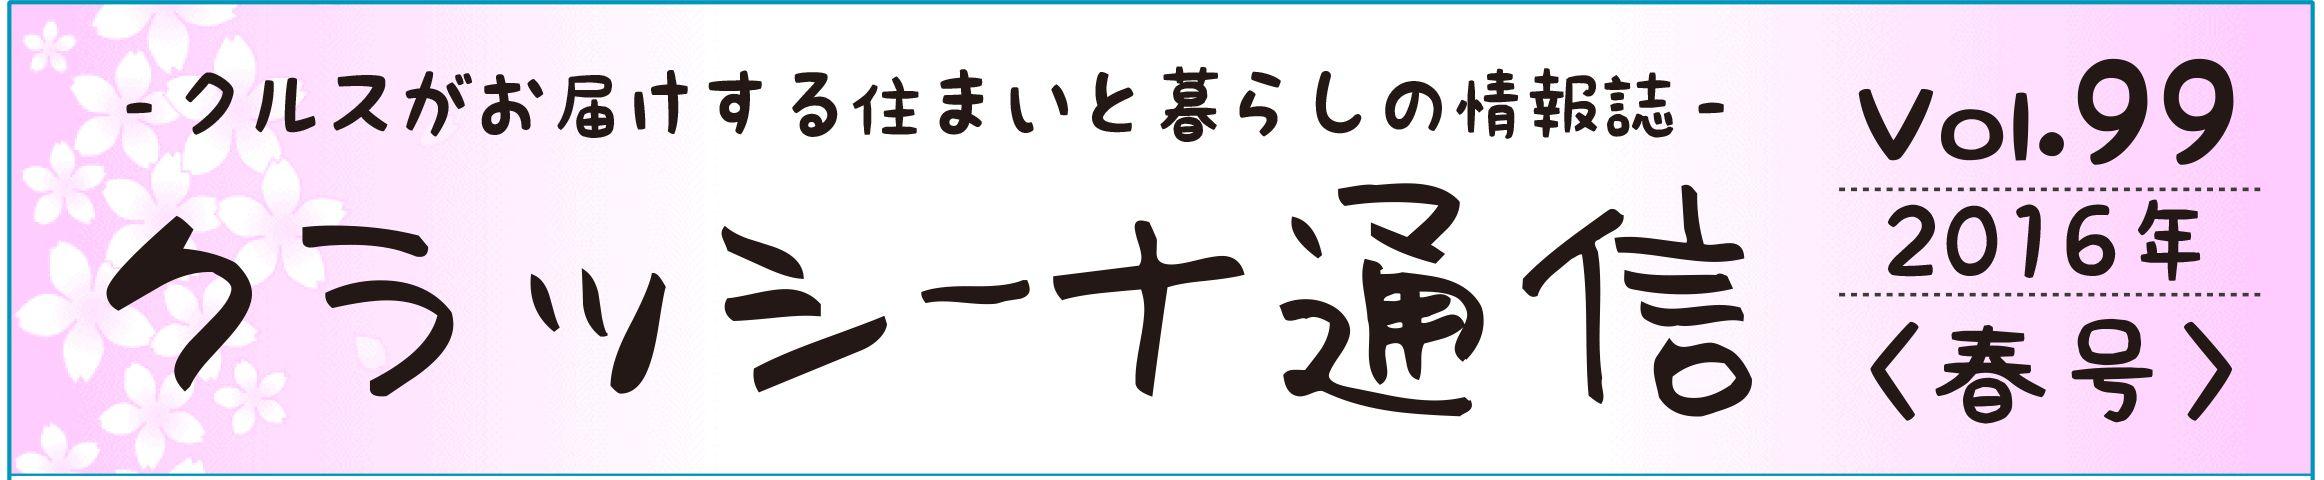 KuraSi-natu-sin99-01.jpg